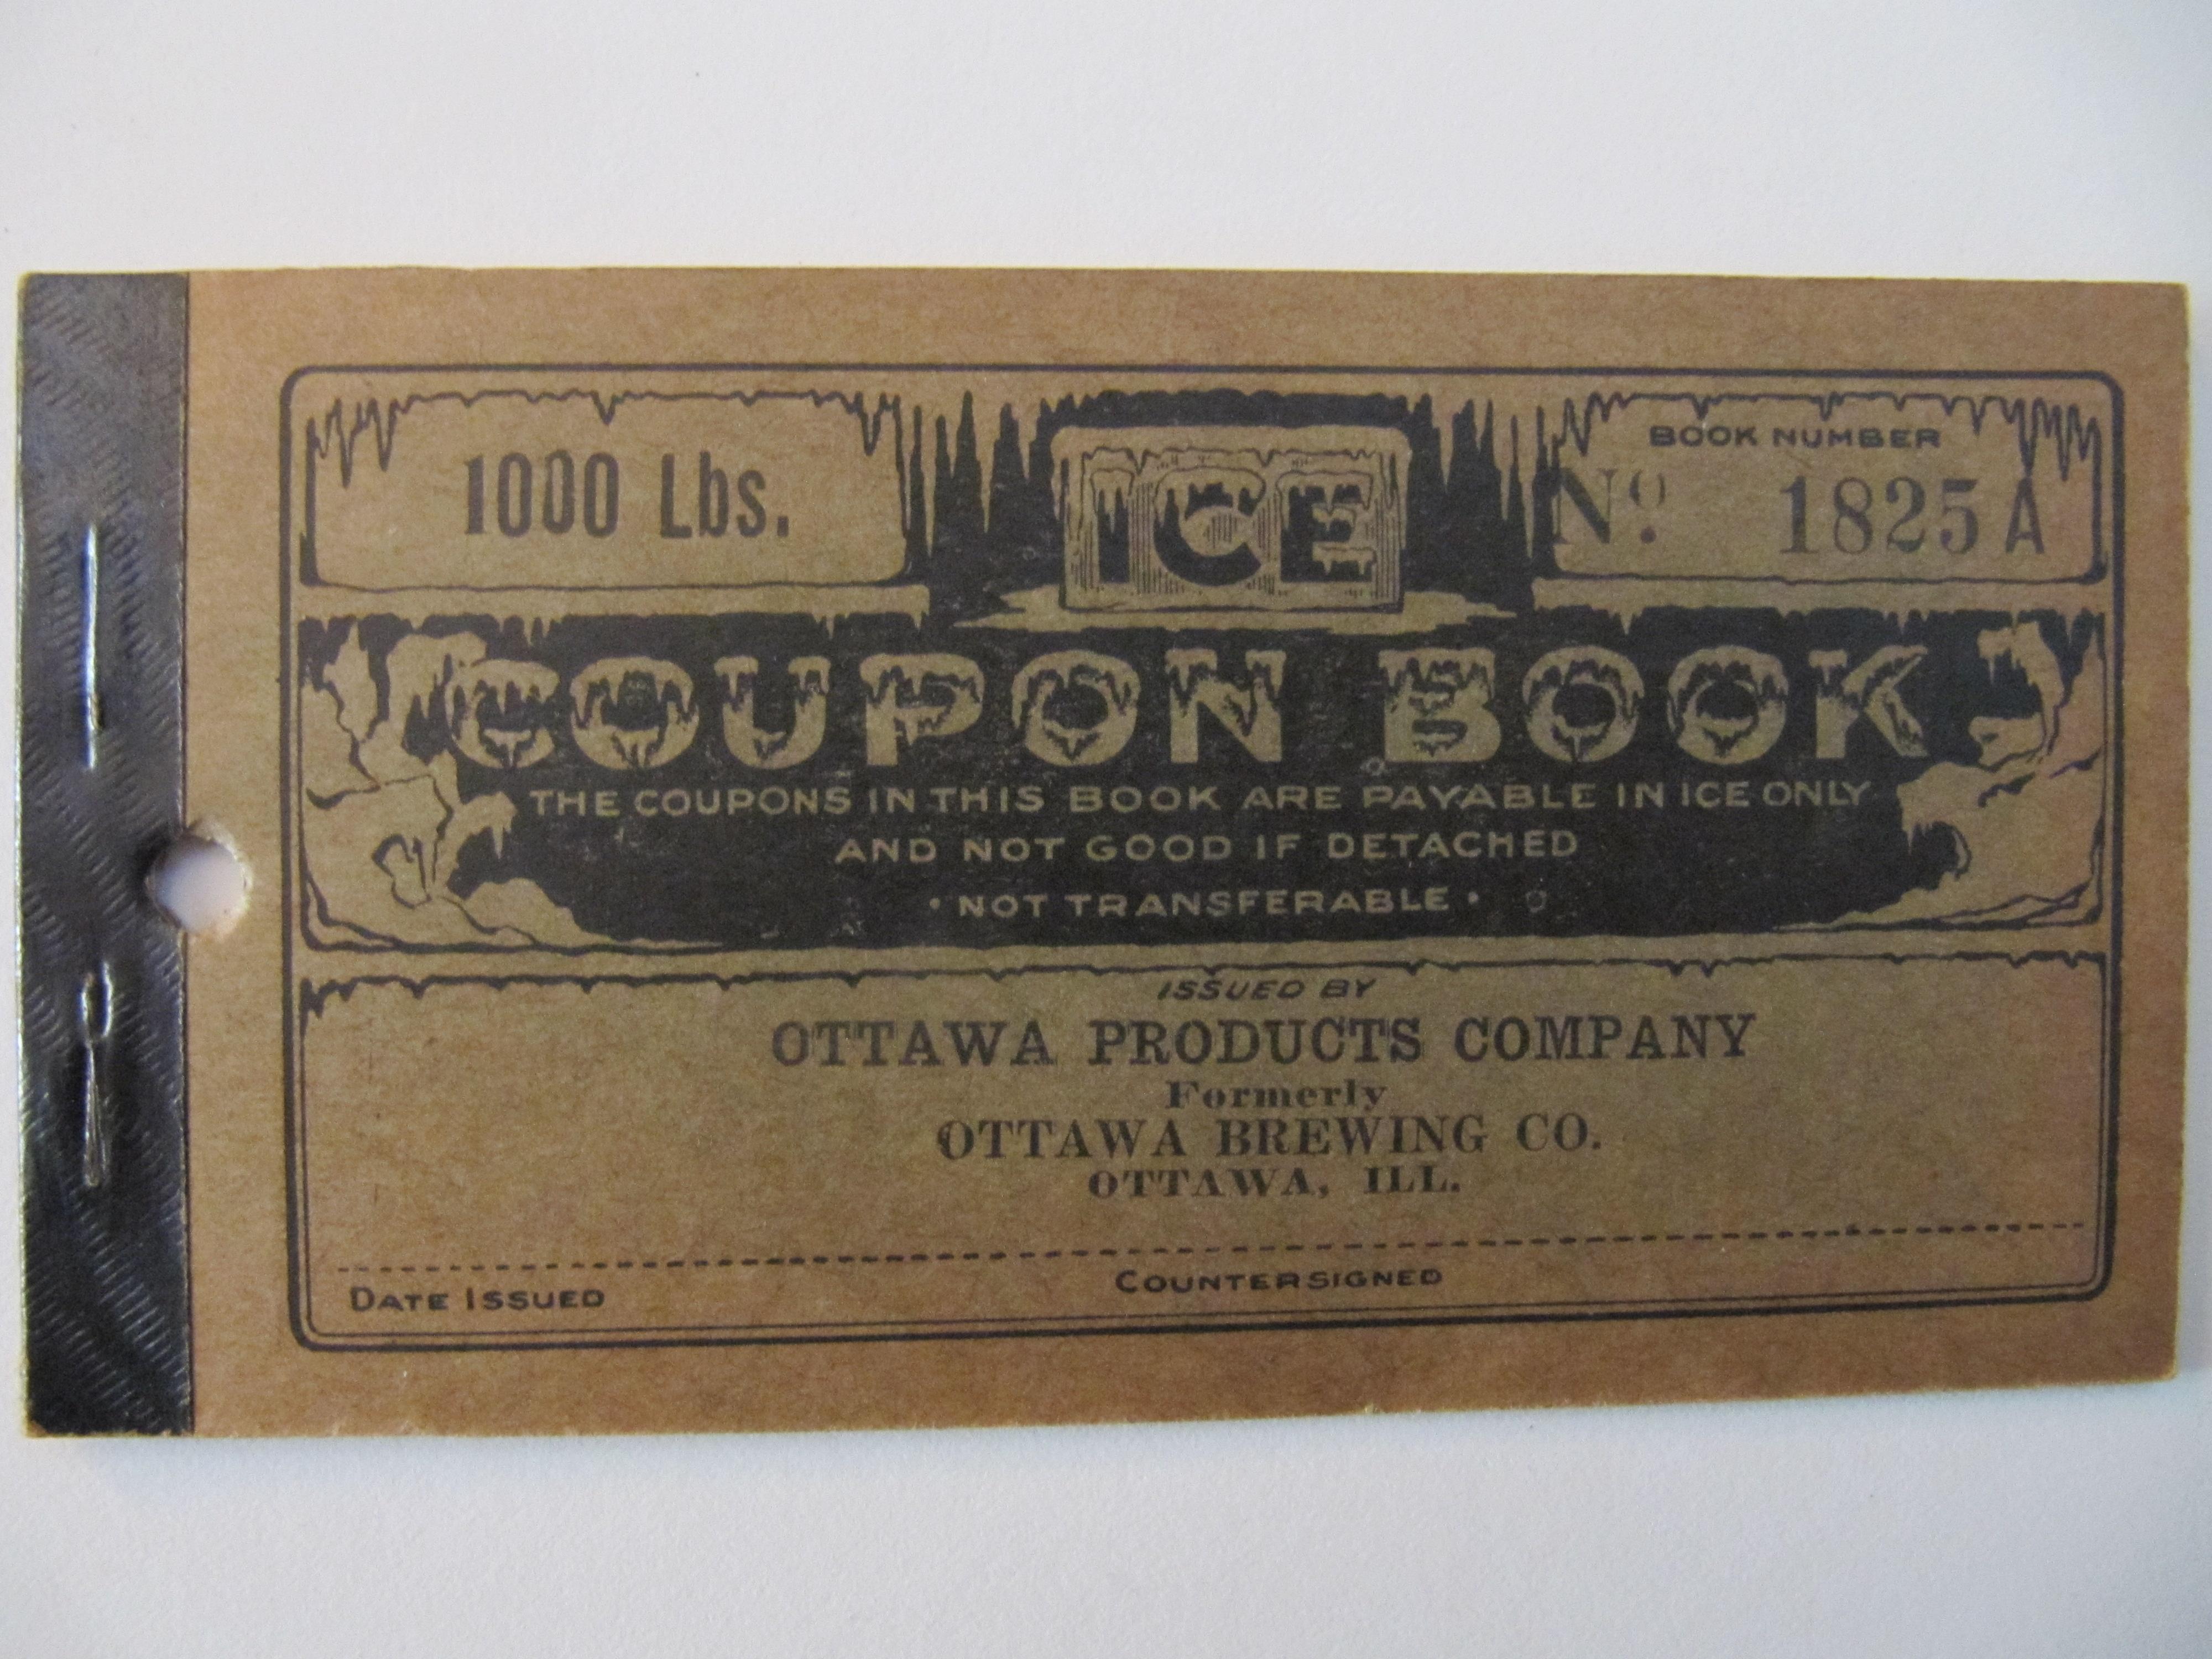 OttawaProductsCo1000_OttawaIll